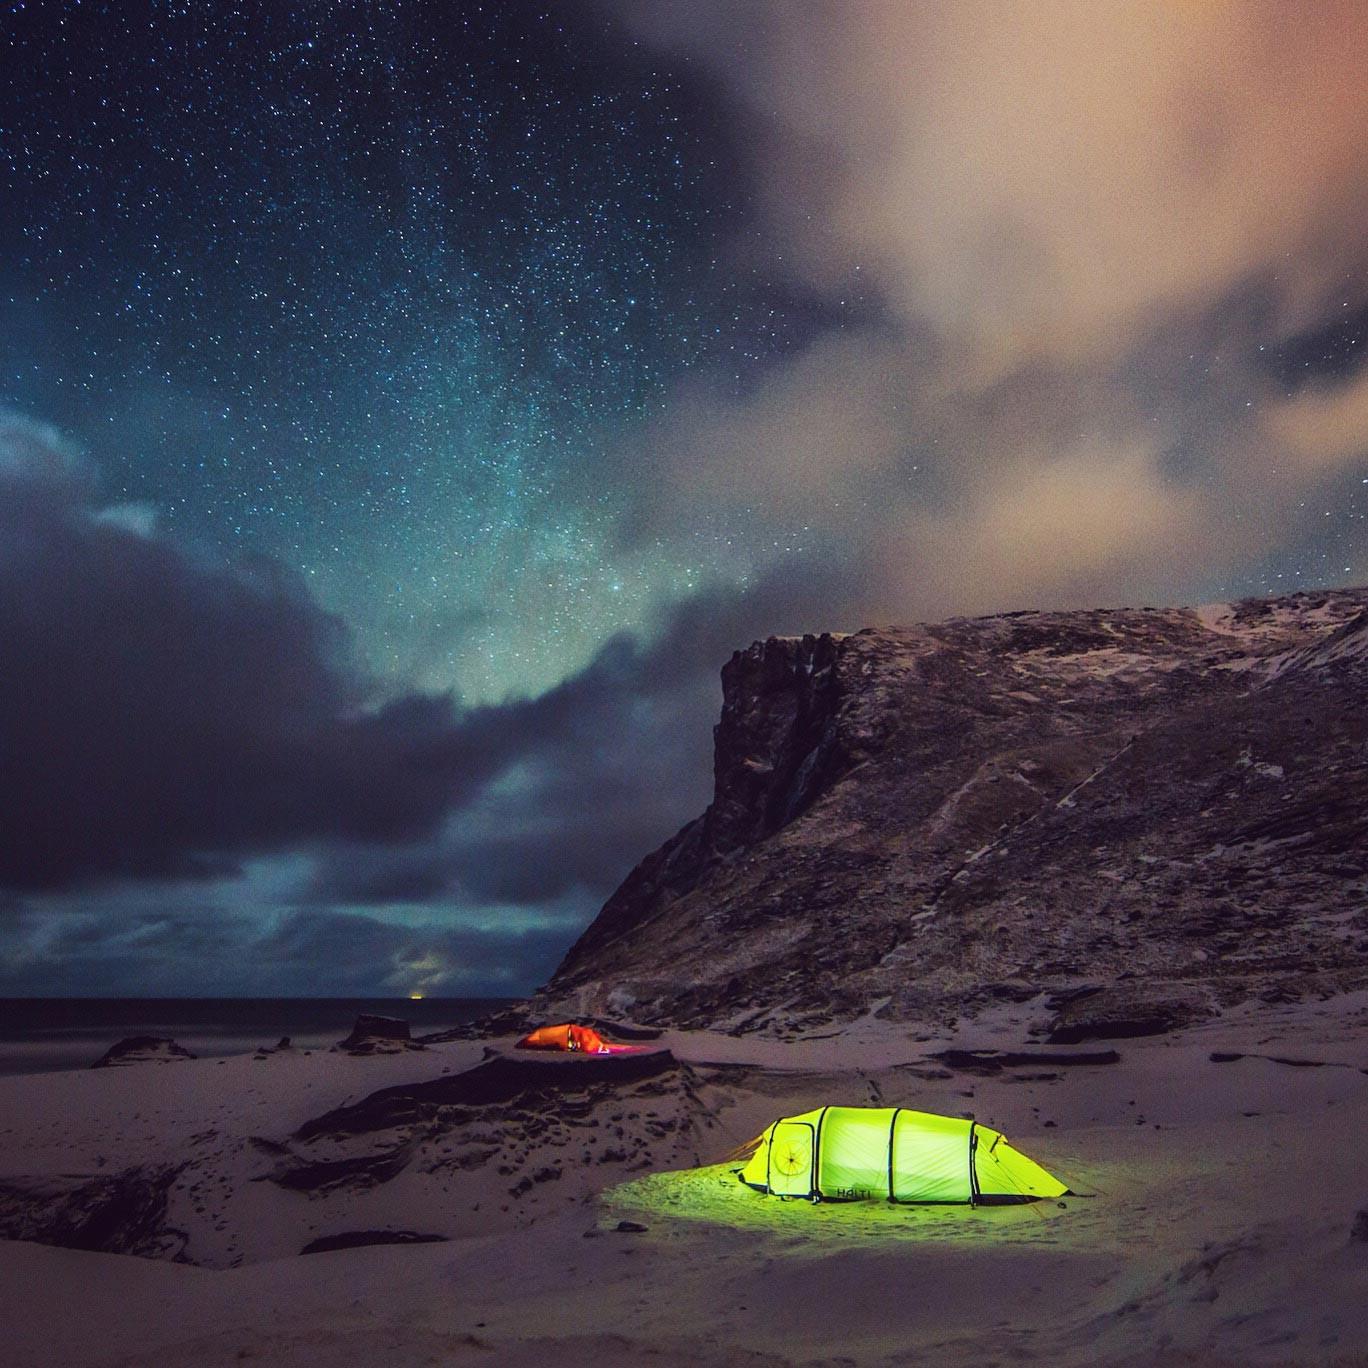 Samuel-Taipale-Lost-in-Lofoten-CampTrend